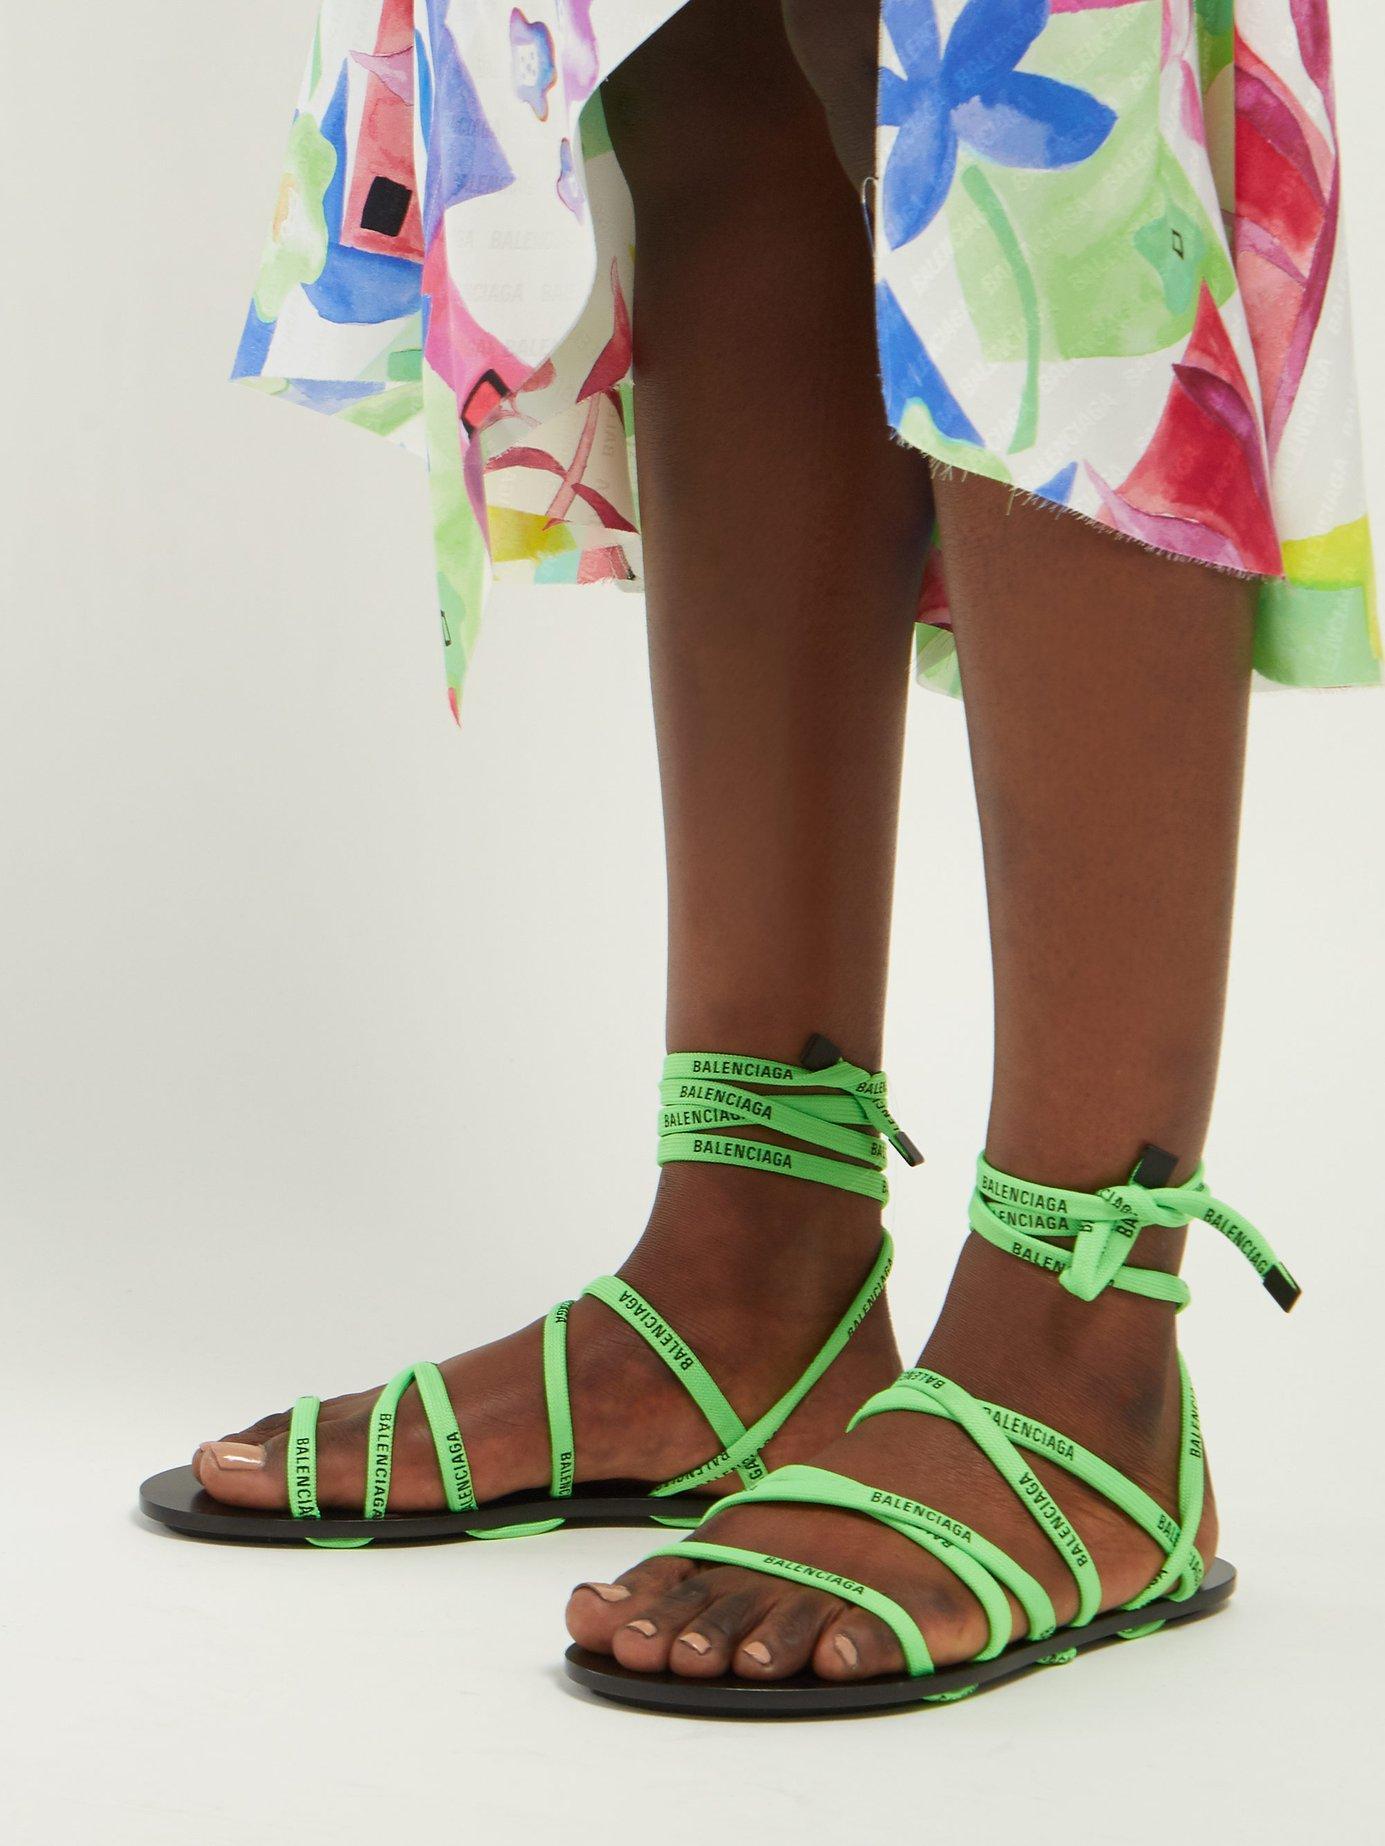 3f51cca71 Balenciaga Logo Laced Wrap Around Flat Sandals in Green - Lyst